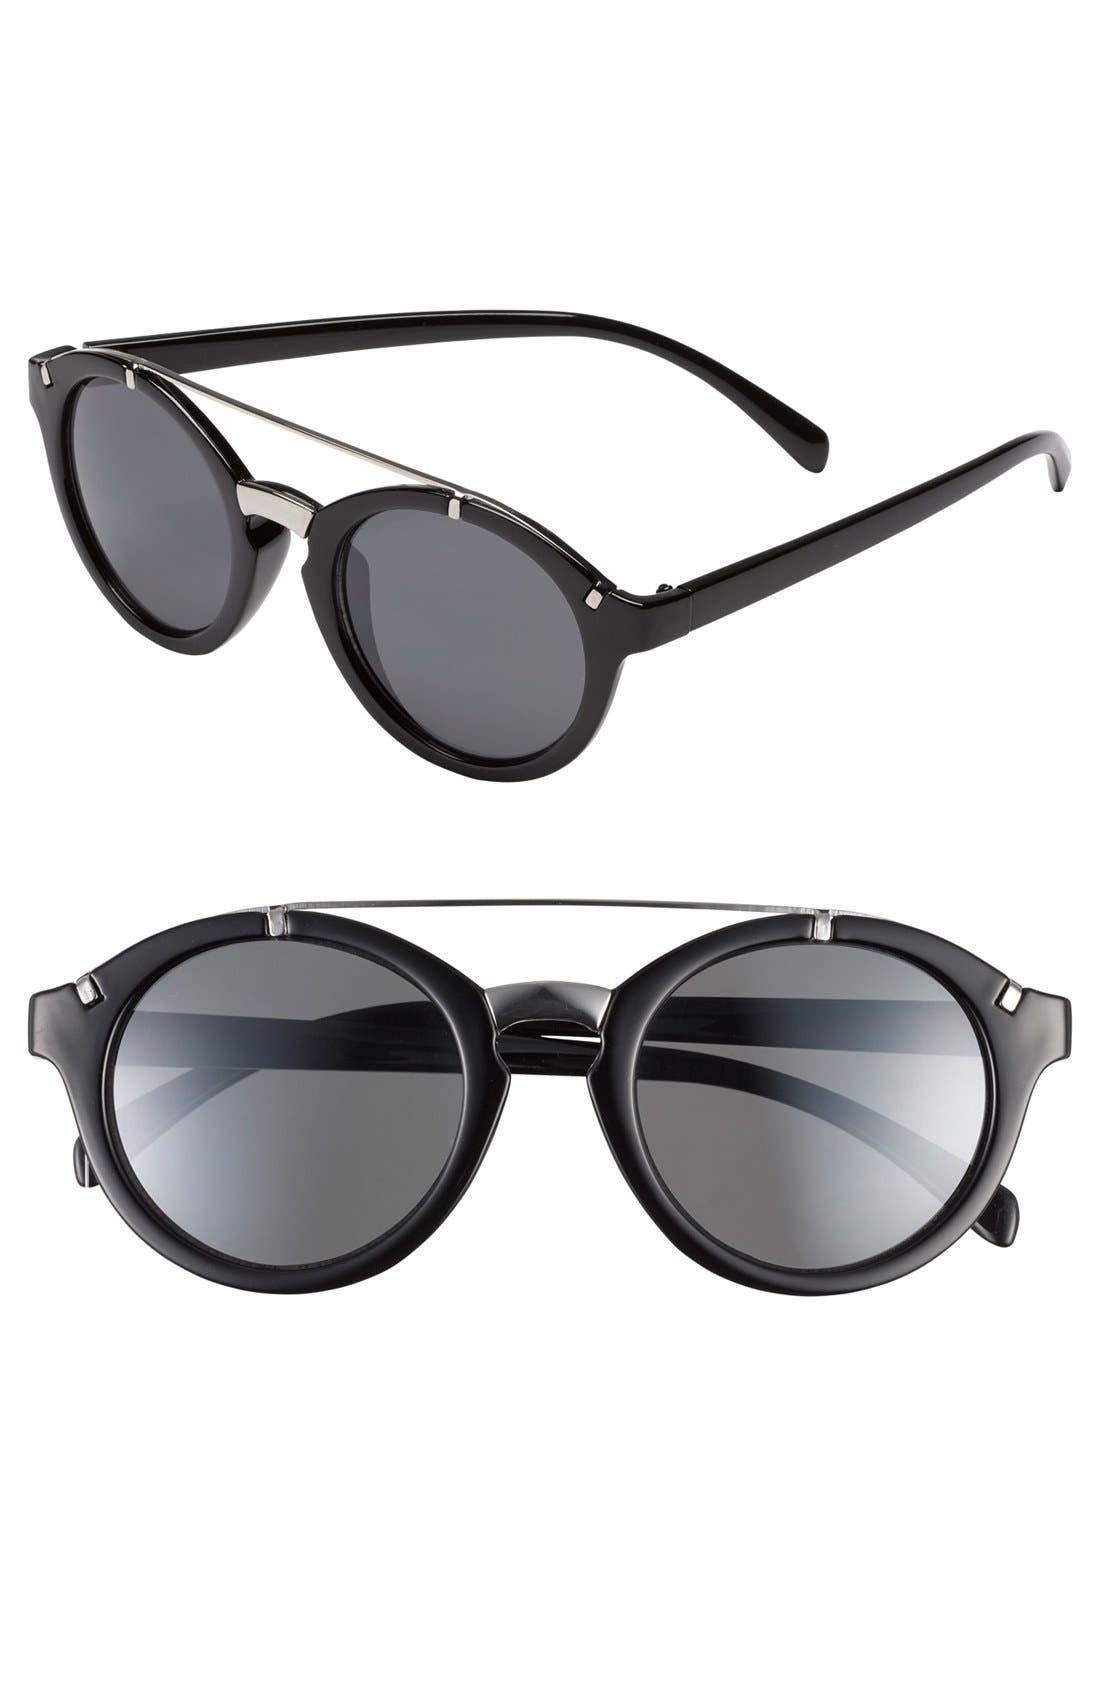 Main Image - Leith Round Cat Eye Sunglasses